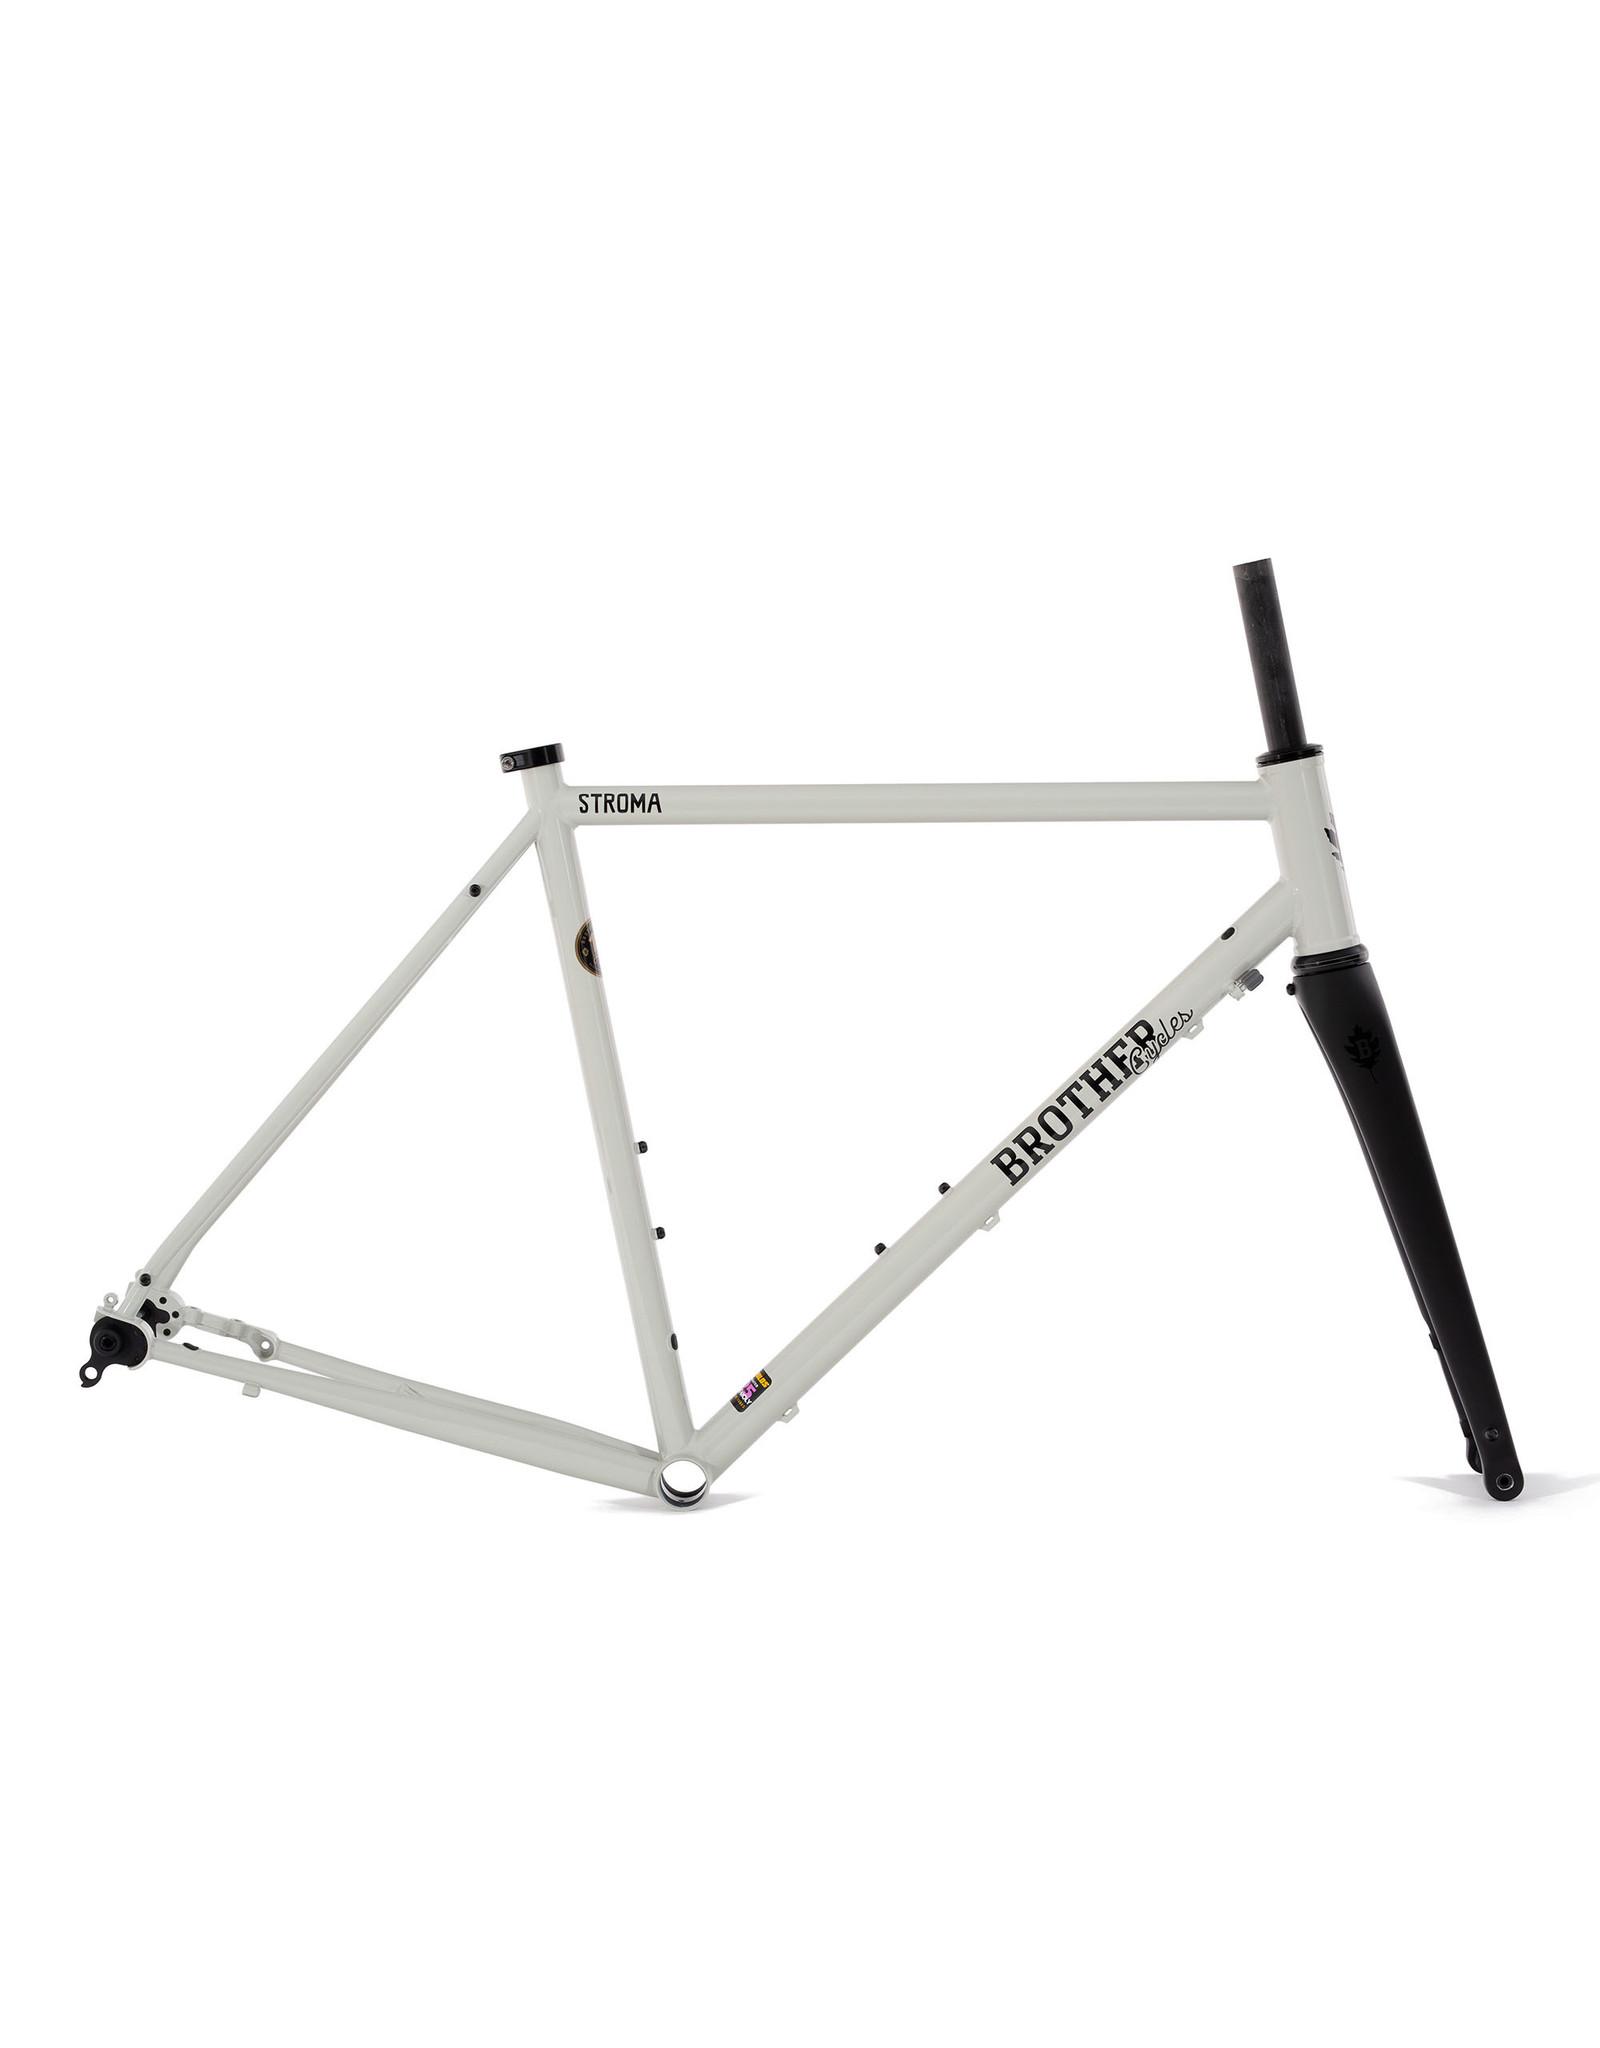 Brother Cycles - Stroma 2020 Frameset - Ivory / Black